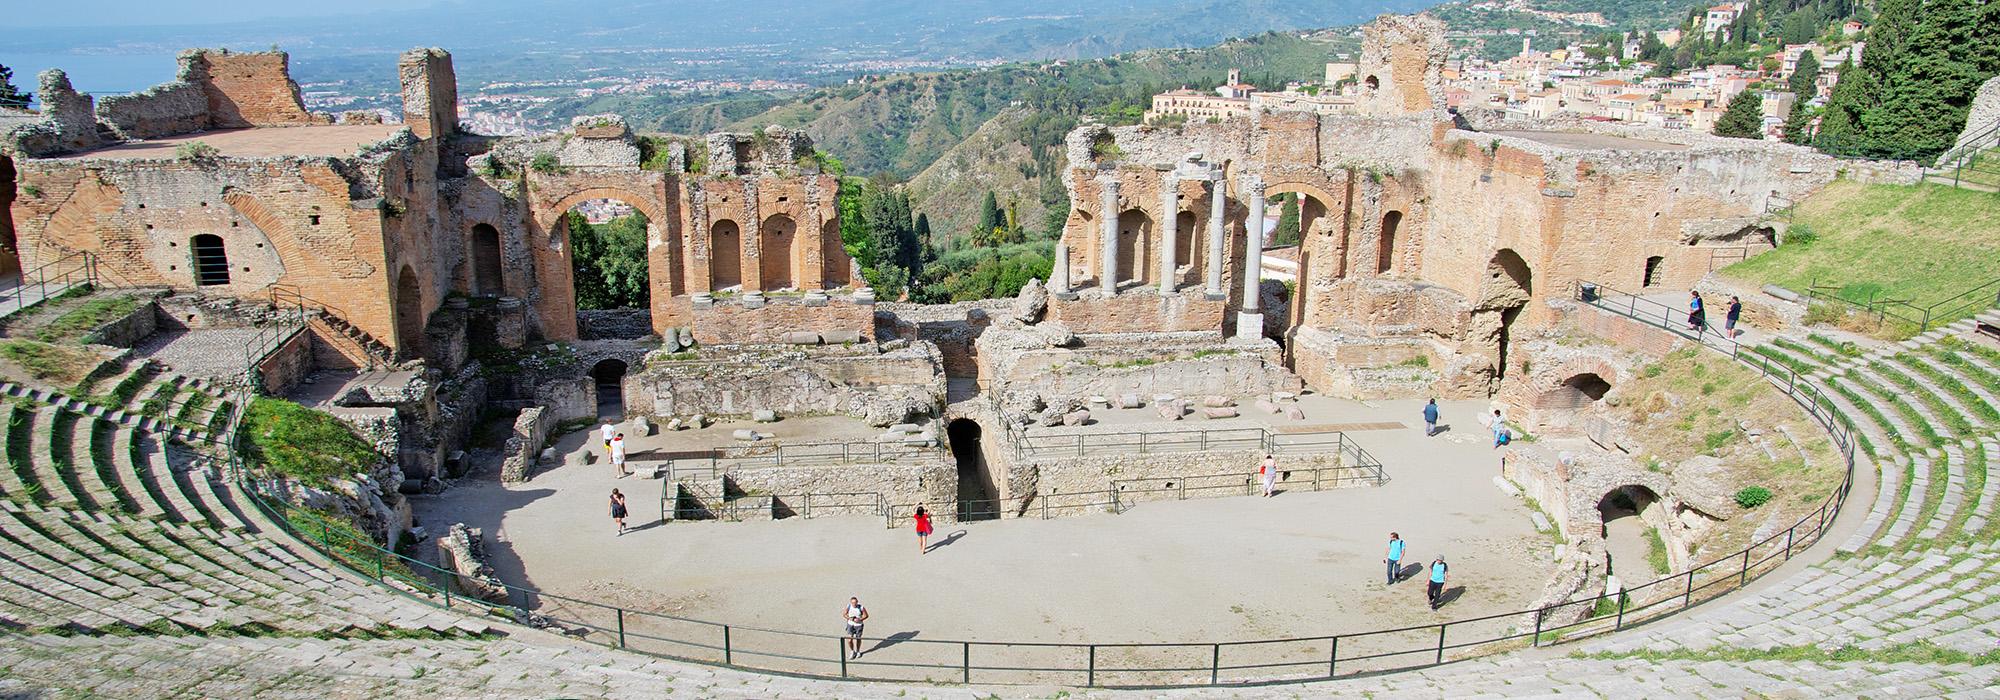 IT_Sicily_GreekTheatreOfTaormina_byRobertNunn_2013_002_Hero.jpg